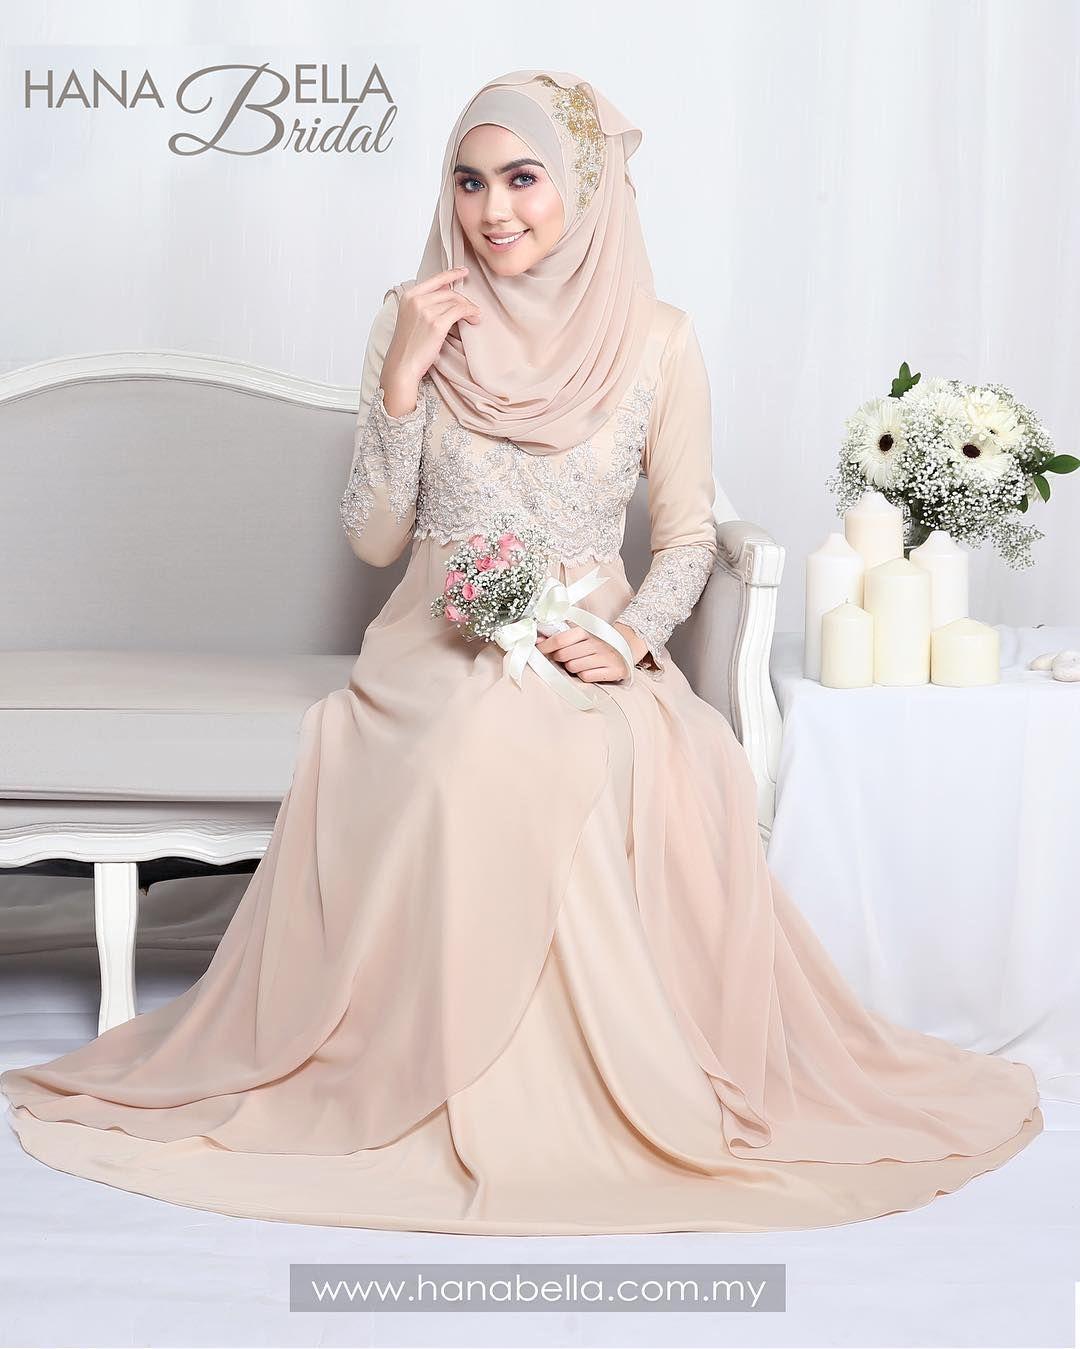 Muslimah Wedding Dress Hijab Dresses Outfits Bridal Lace Veils Wear Bride Dreams